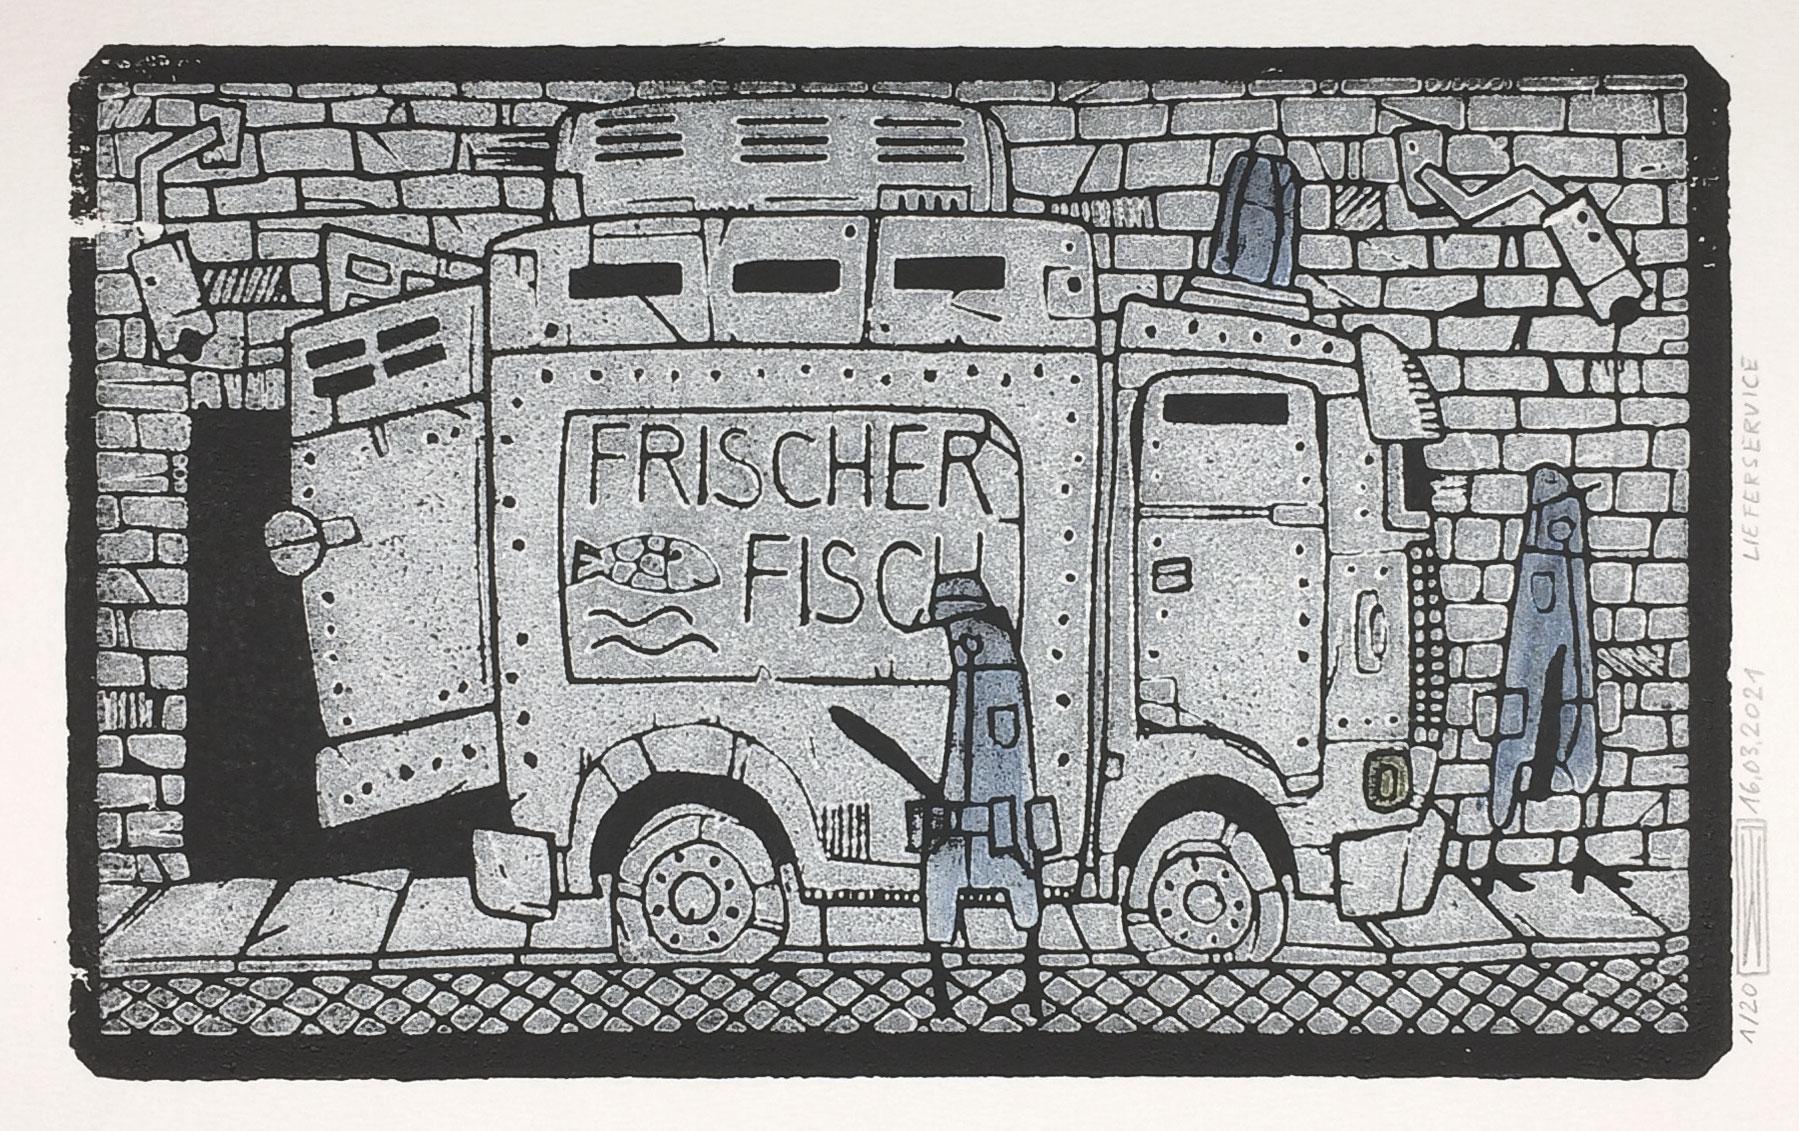 Lieferservice, Linoldruck, 21 x 13 cm